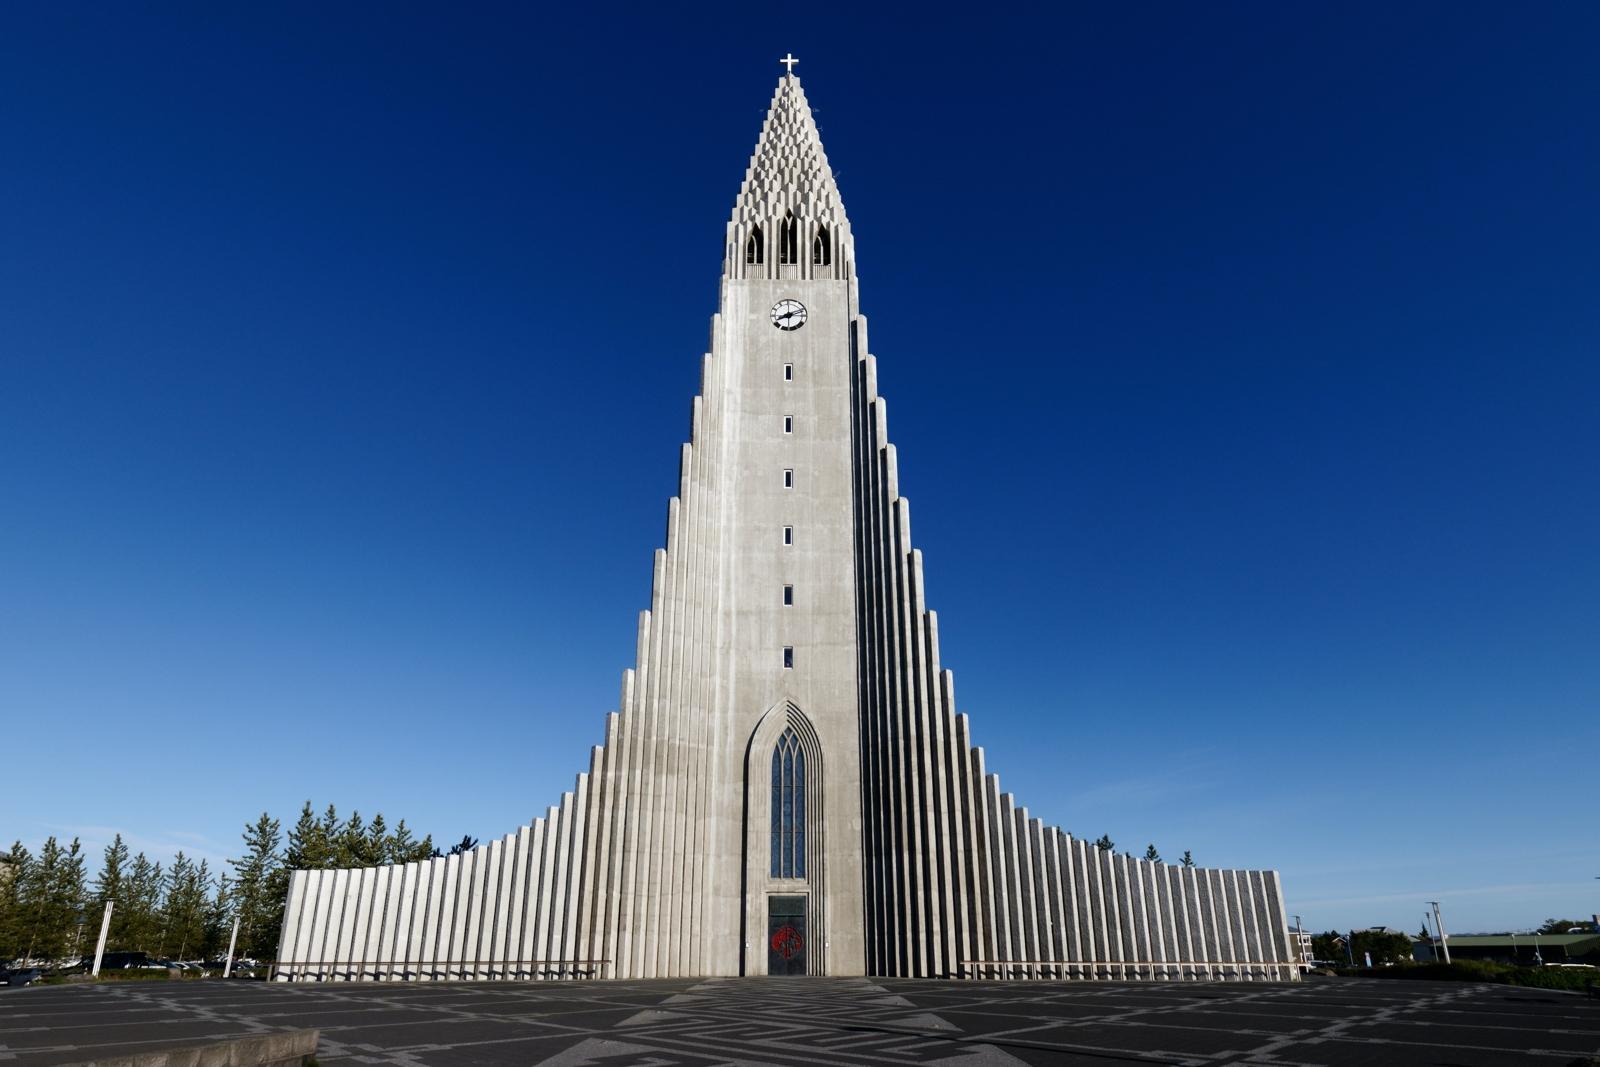 Hallgrímskirkja - Reykjavík